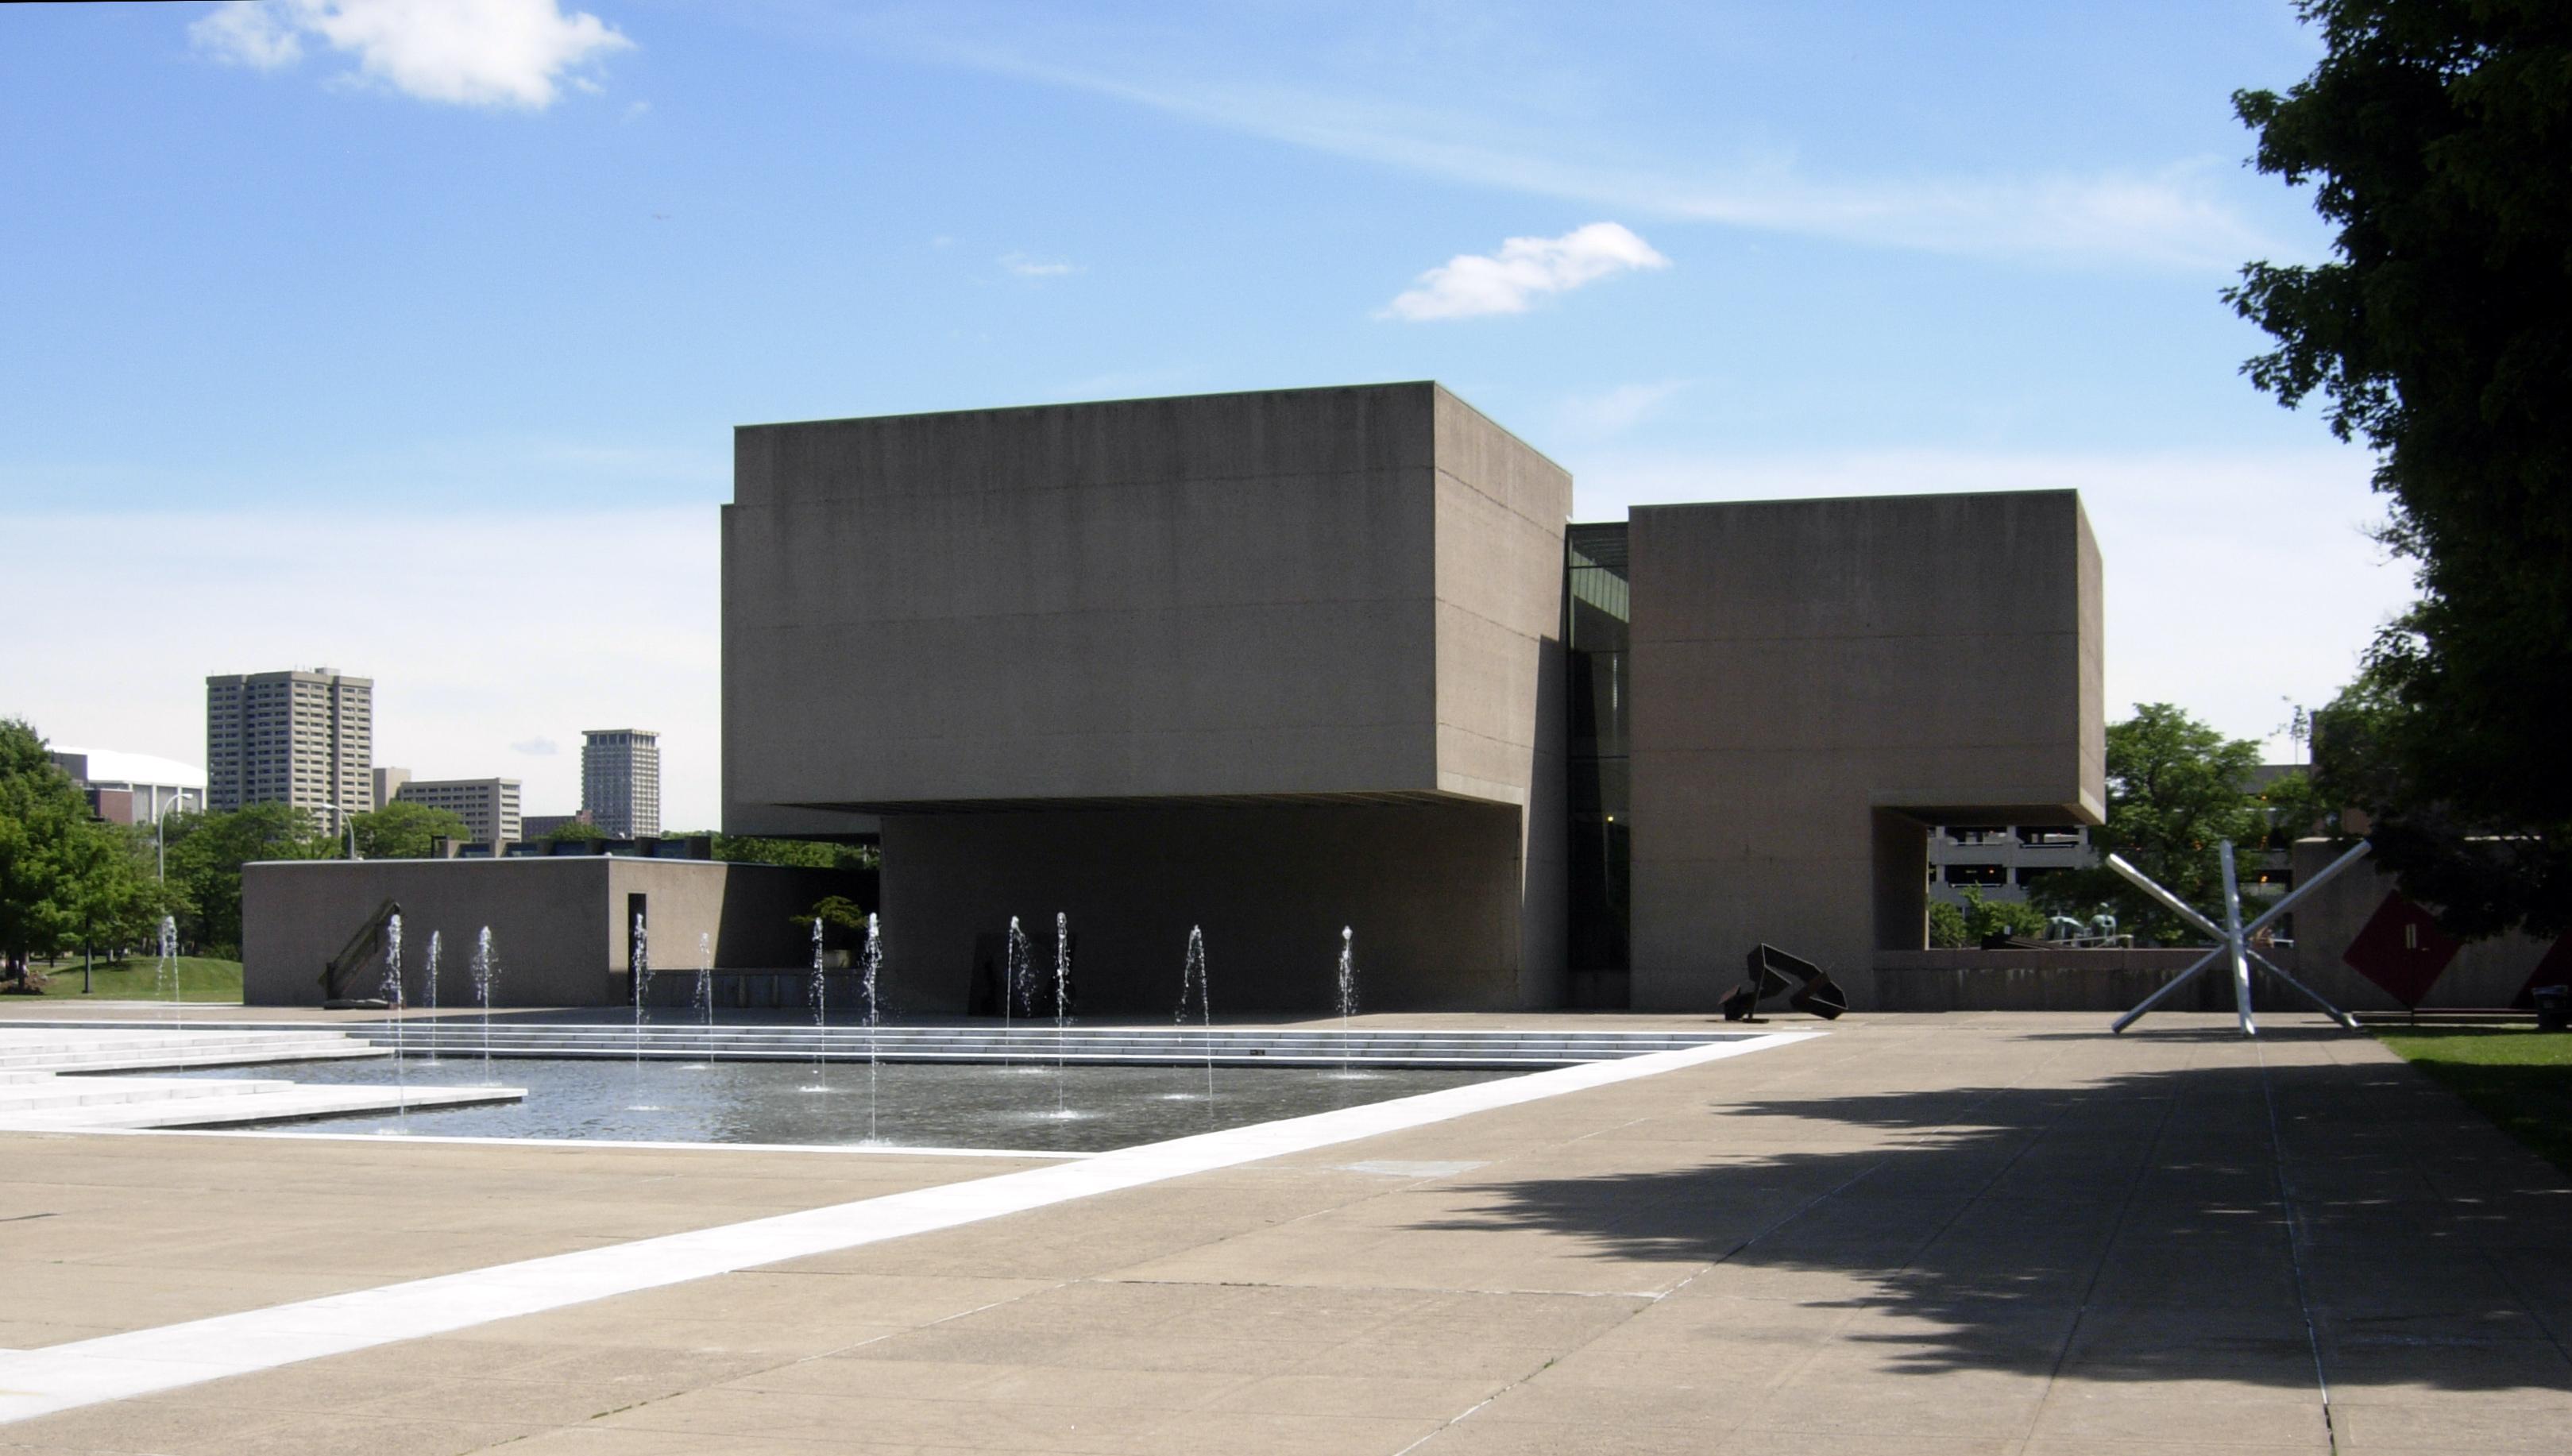 Museum building, designed by [[I. M. Pei]]